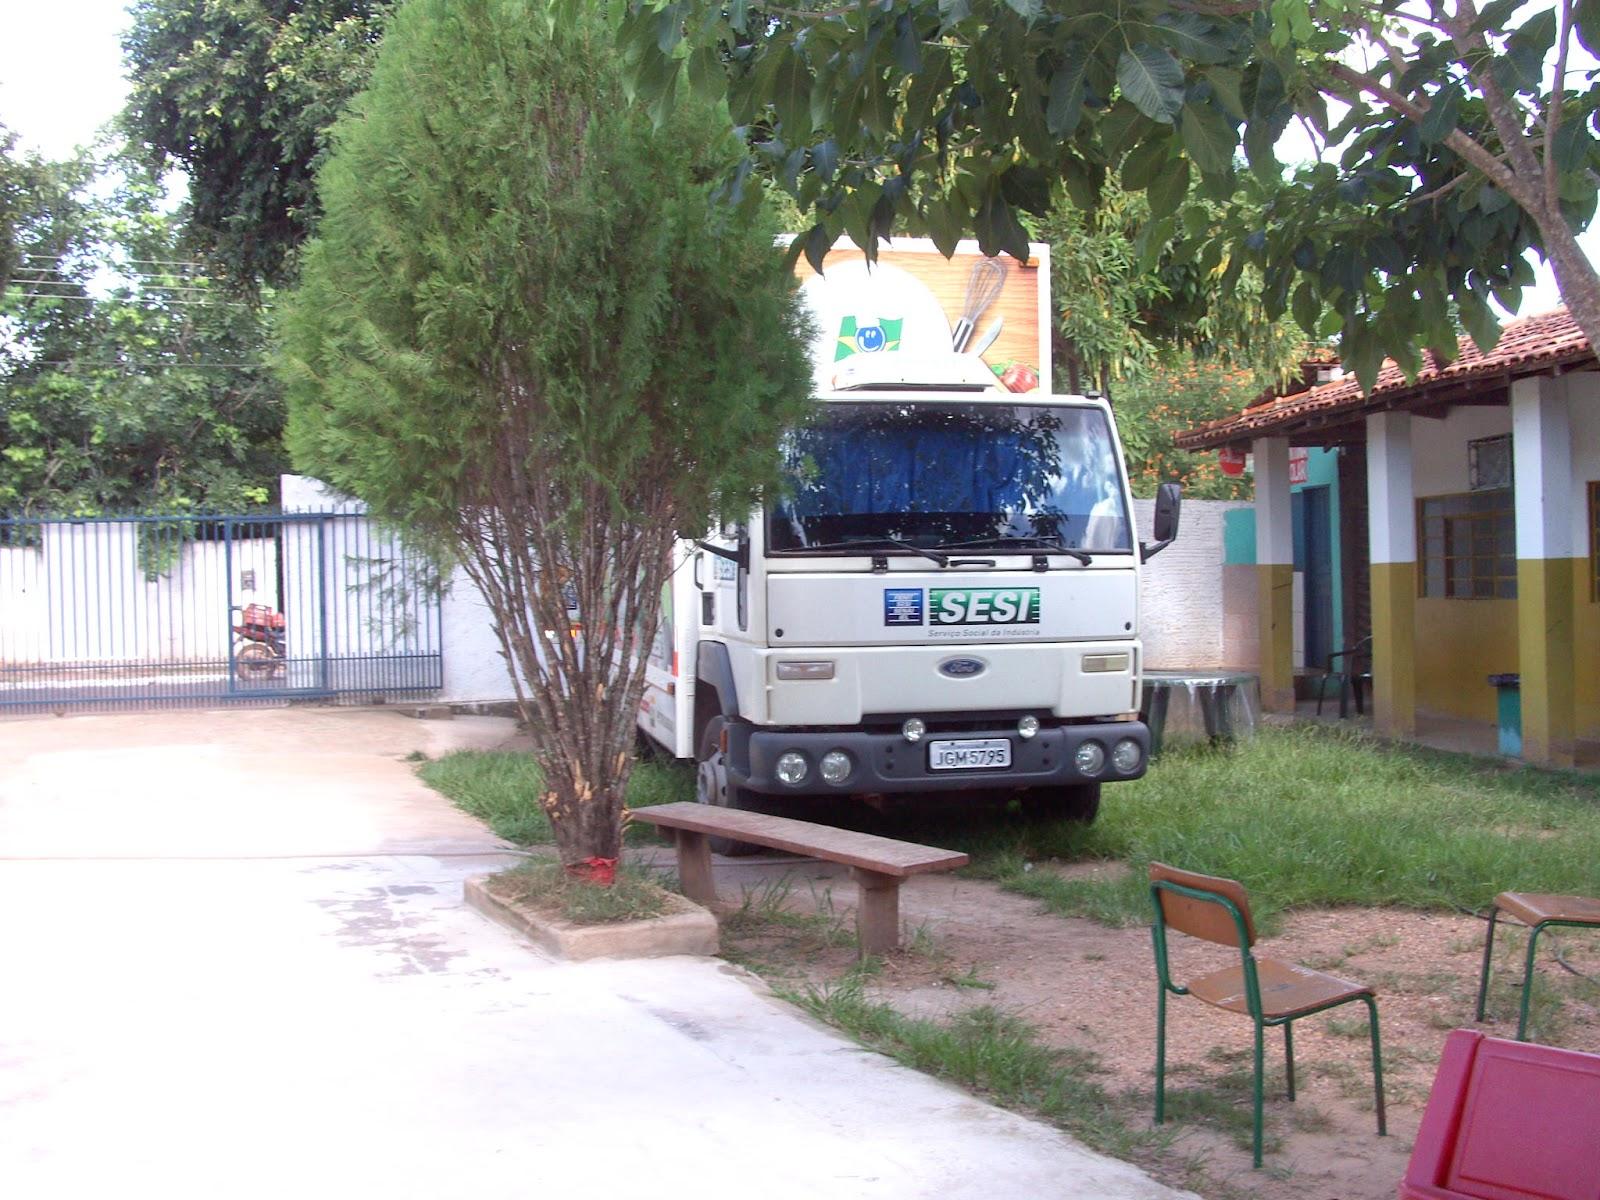 procure o SESI de sua Região. Acesse: www.sesi.org.br/cozinahbrasil #874466 1600 1200